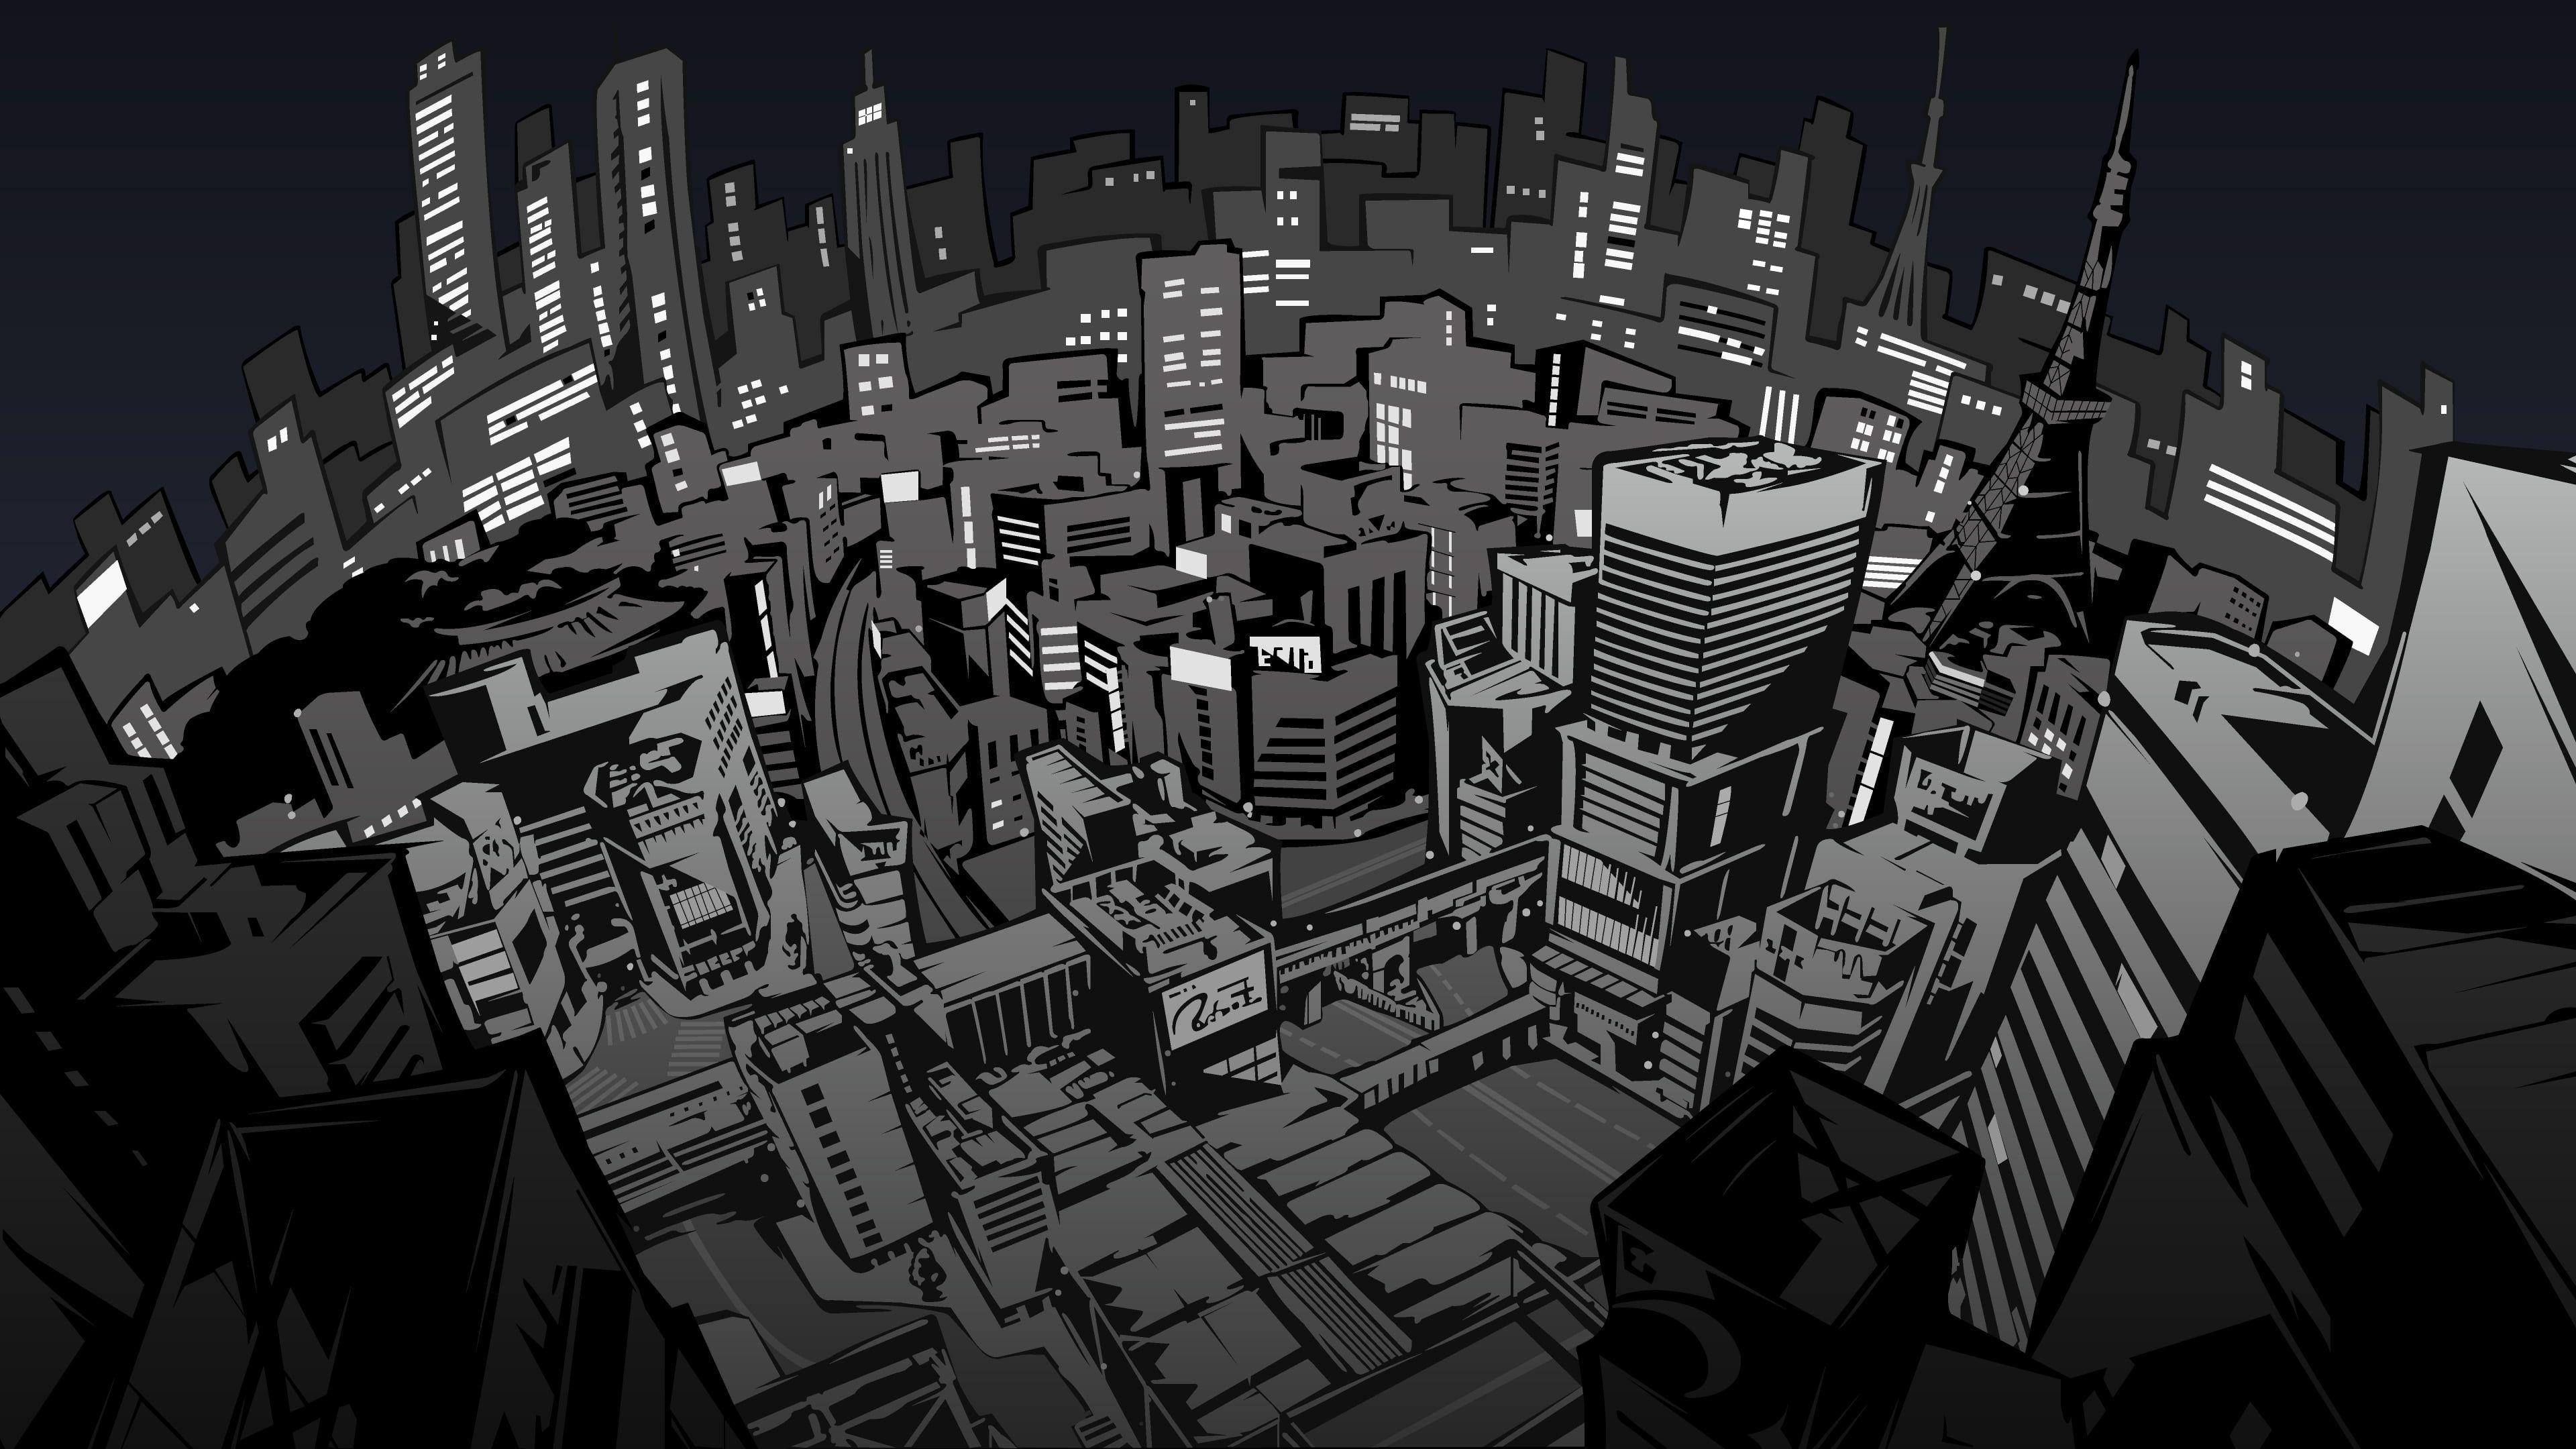 Animated City Illustration Persona 5 Video Games Persona Series 4k Wallpaper Hdwallpaper Desktop In 2020 Persona 5 City Illustration Persona